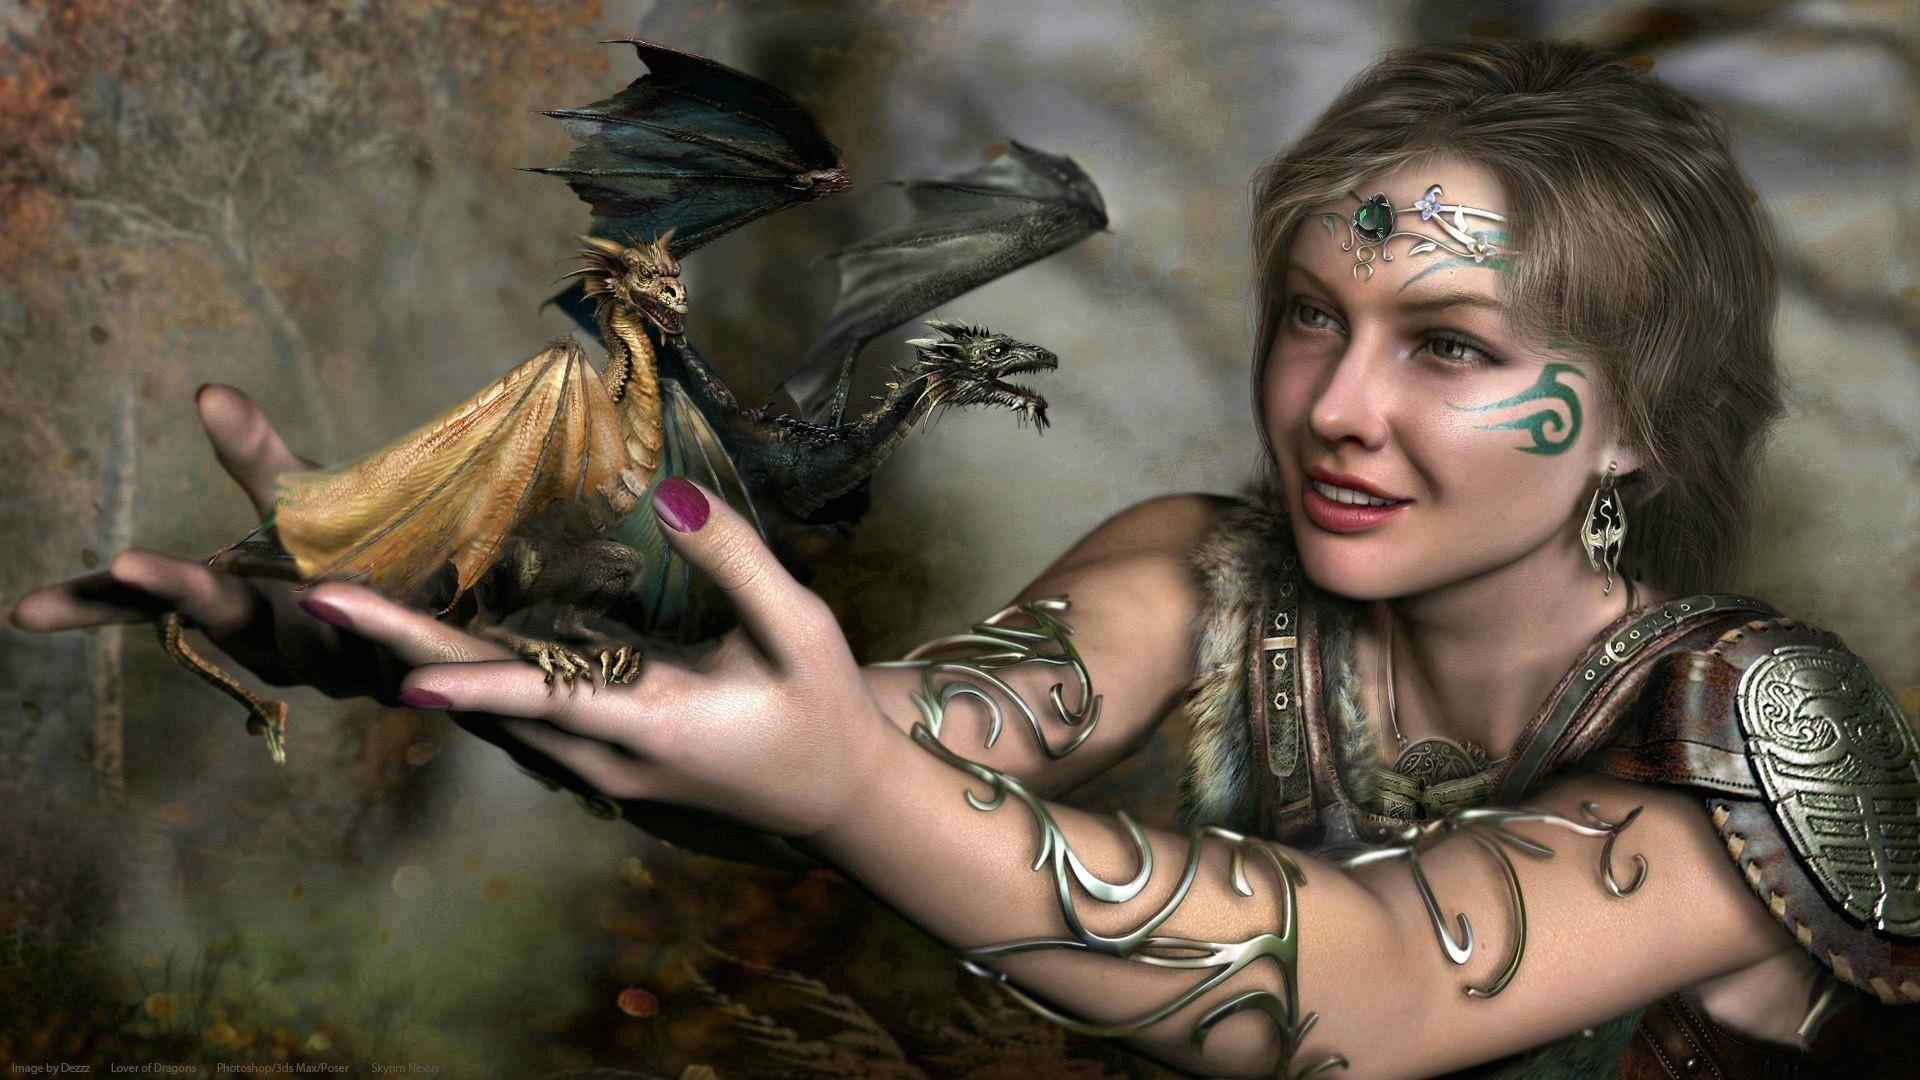 Beautiful Fantasy Girl With Dragon Tattoos HD Wallpaper – Stylish HD .